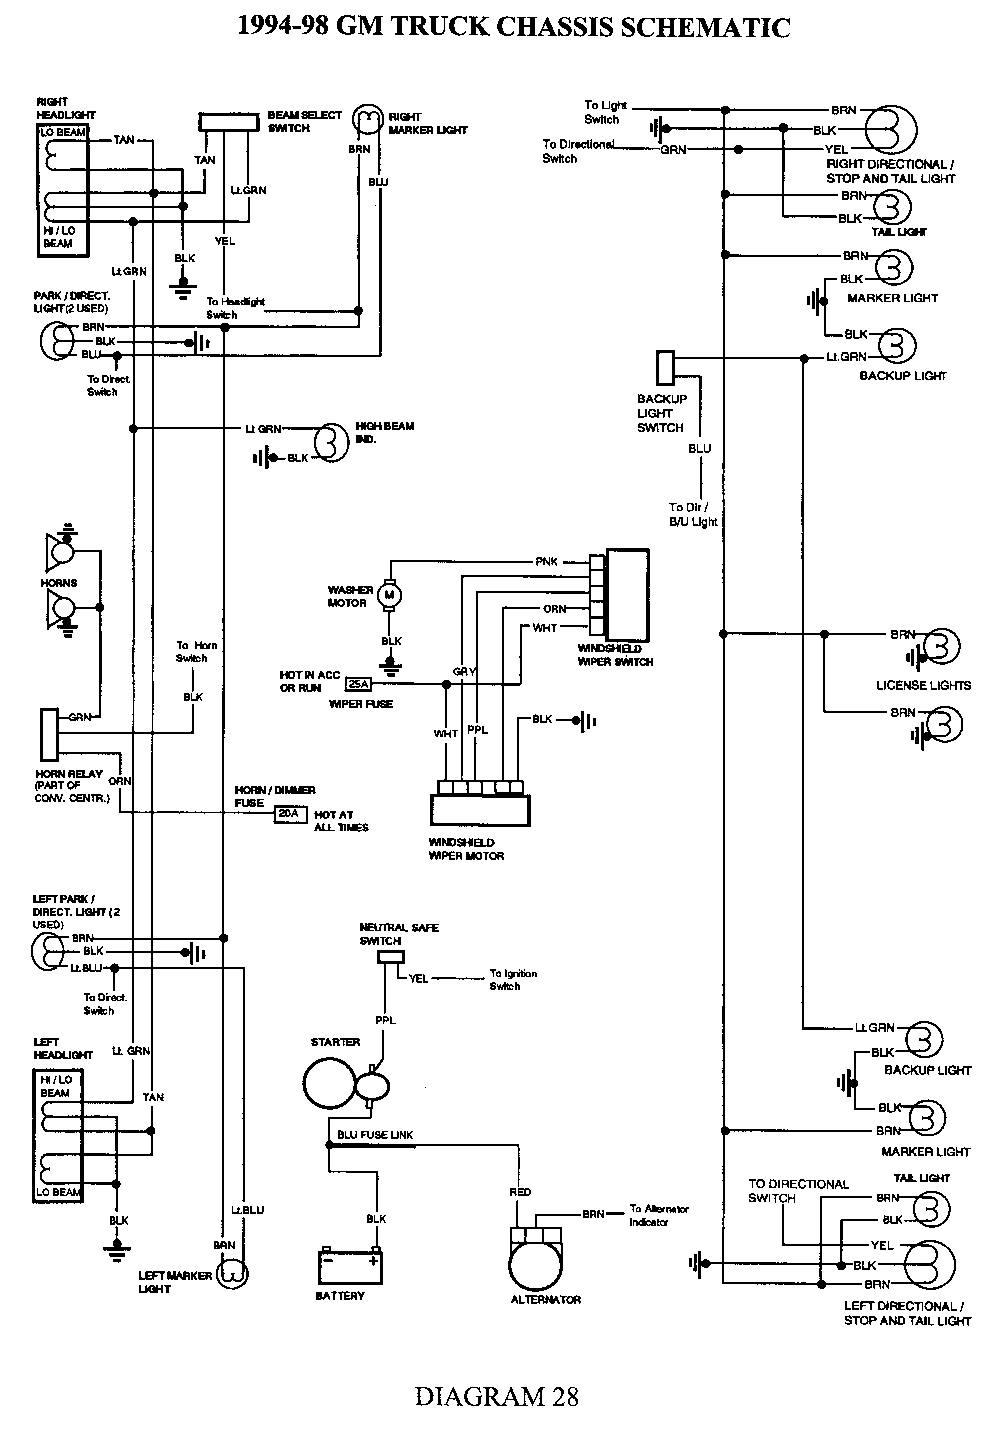 2004 Chevy Cavalier Wiring Diagram | Wiring Diagram - 2004 Chevy Cavalier Stereo Wiring Diagram